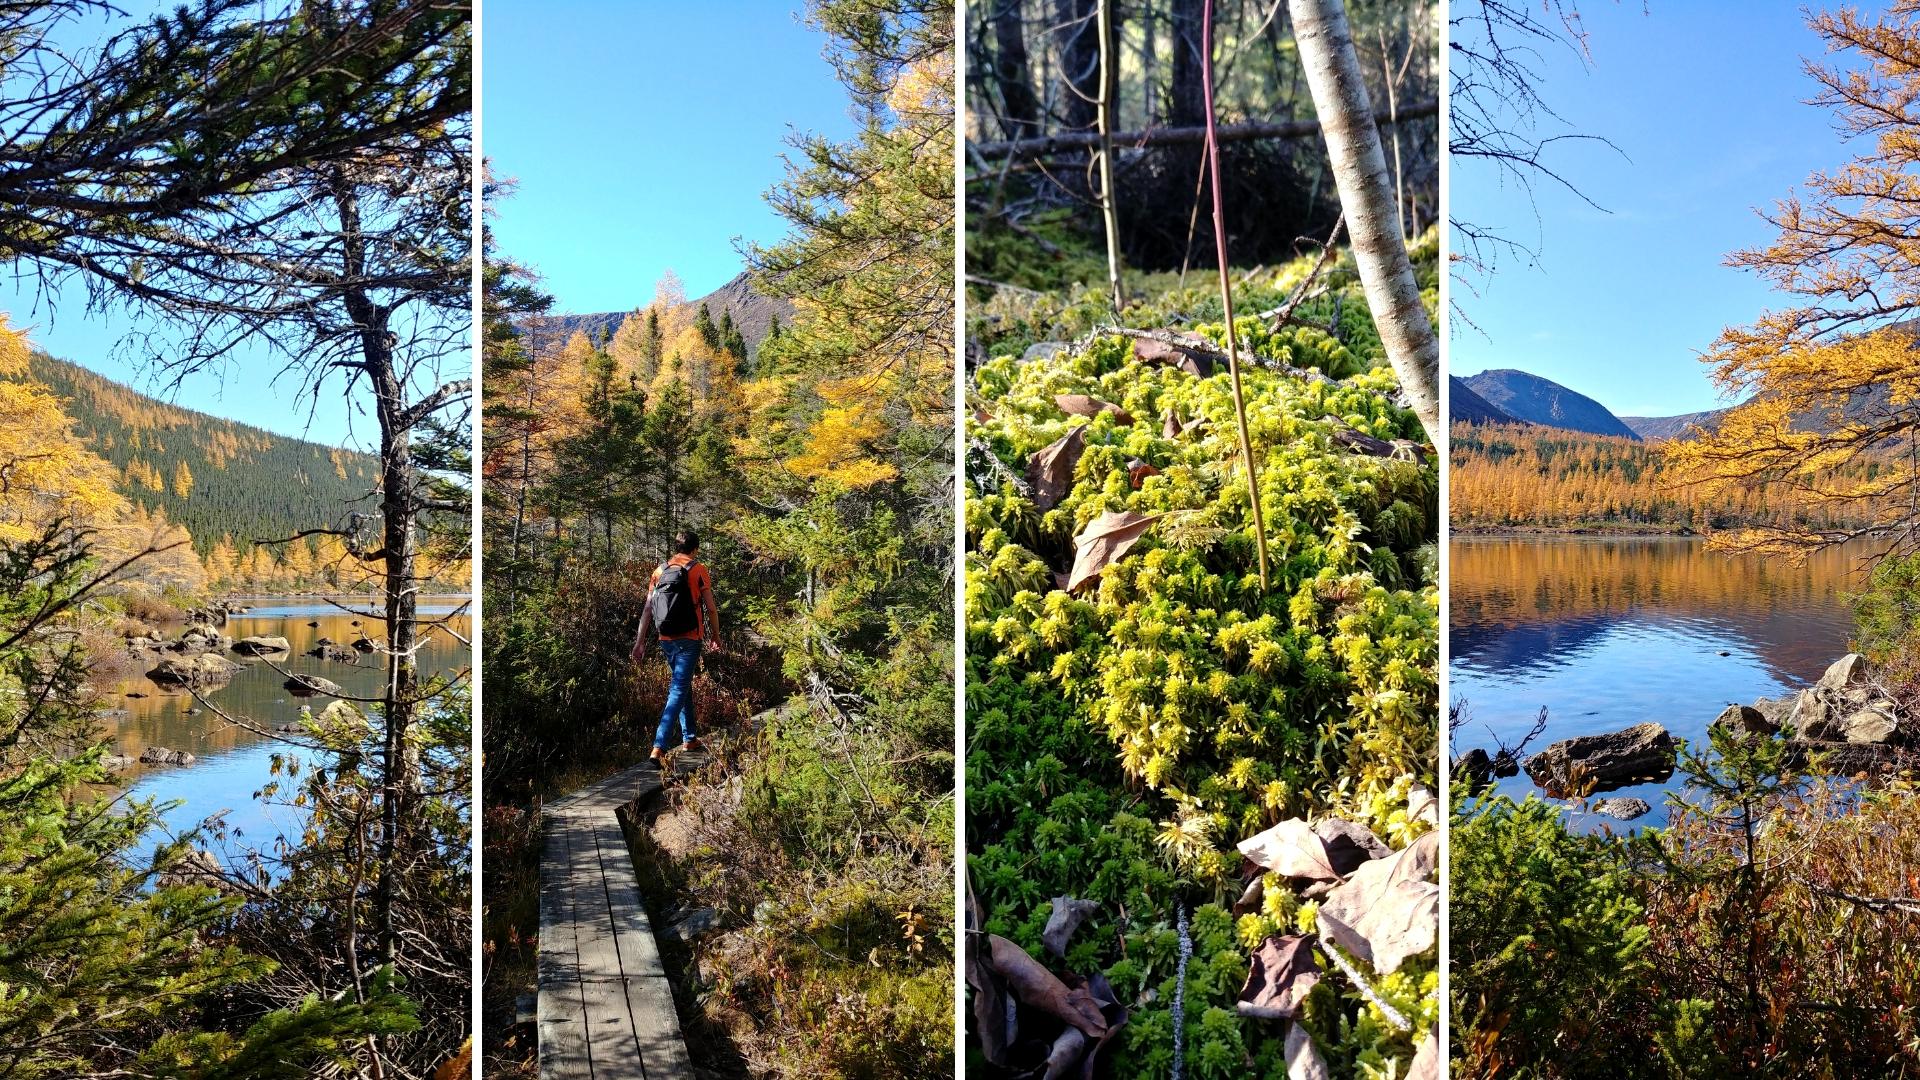 abri serpentine parc national gaspesie automne blog voyage canada road-trip arpenter le chemin